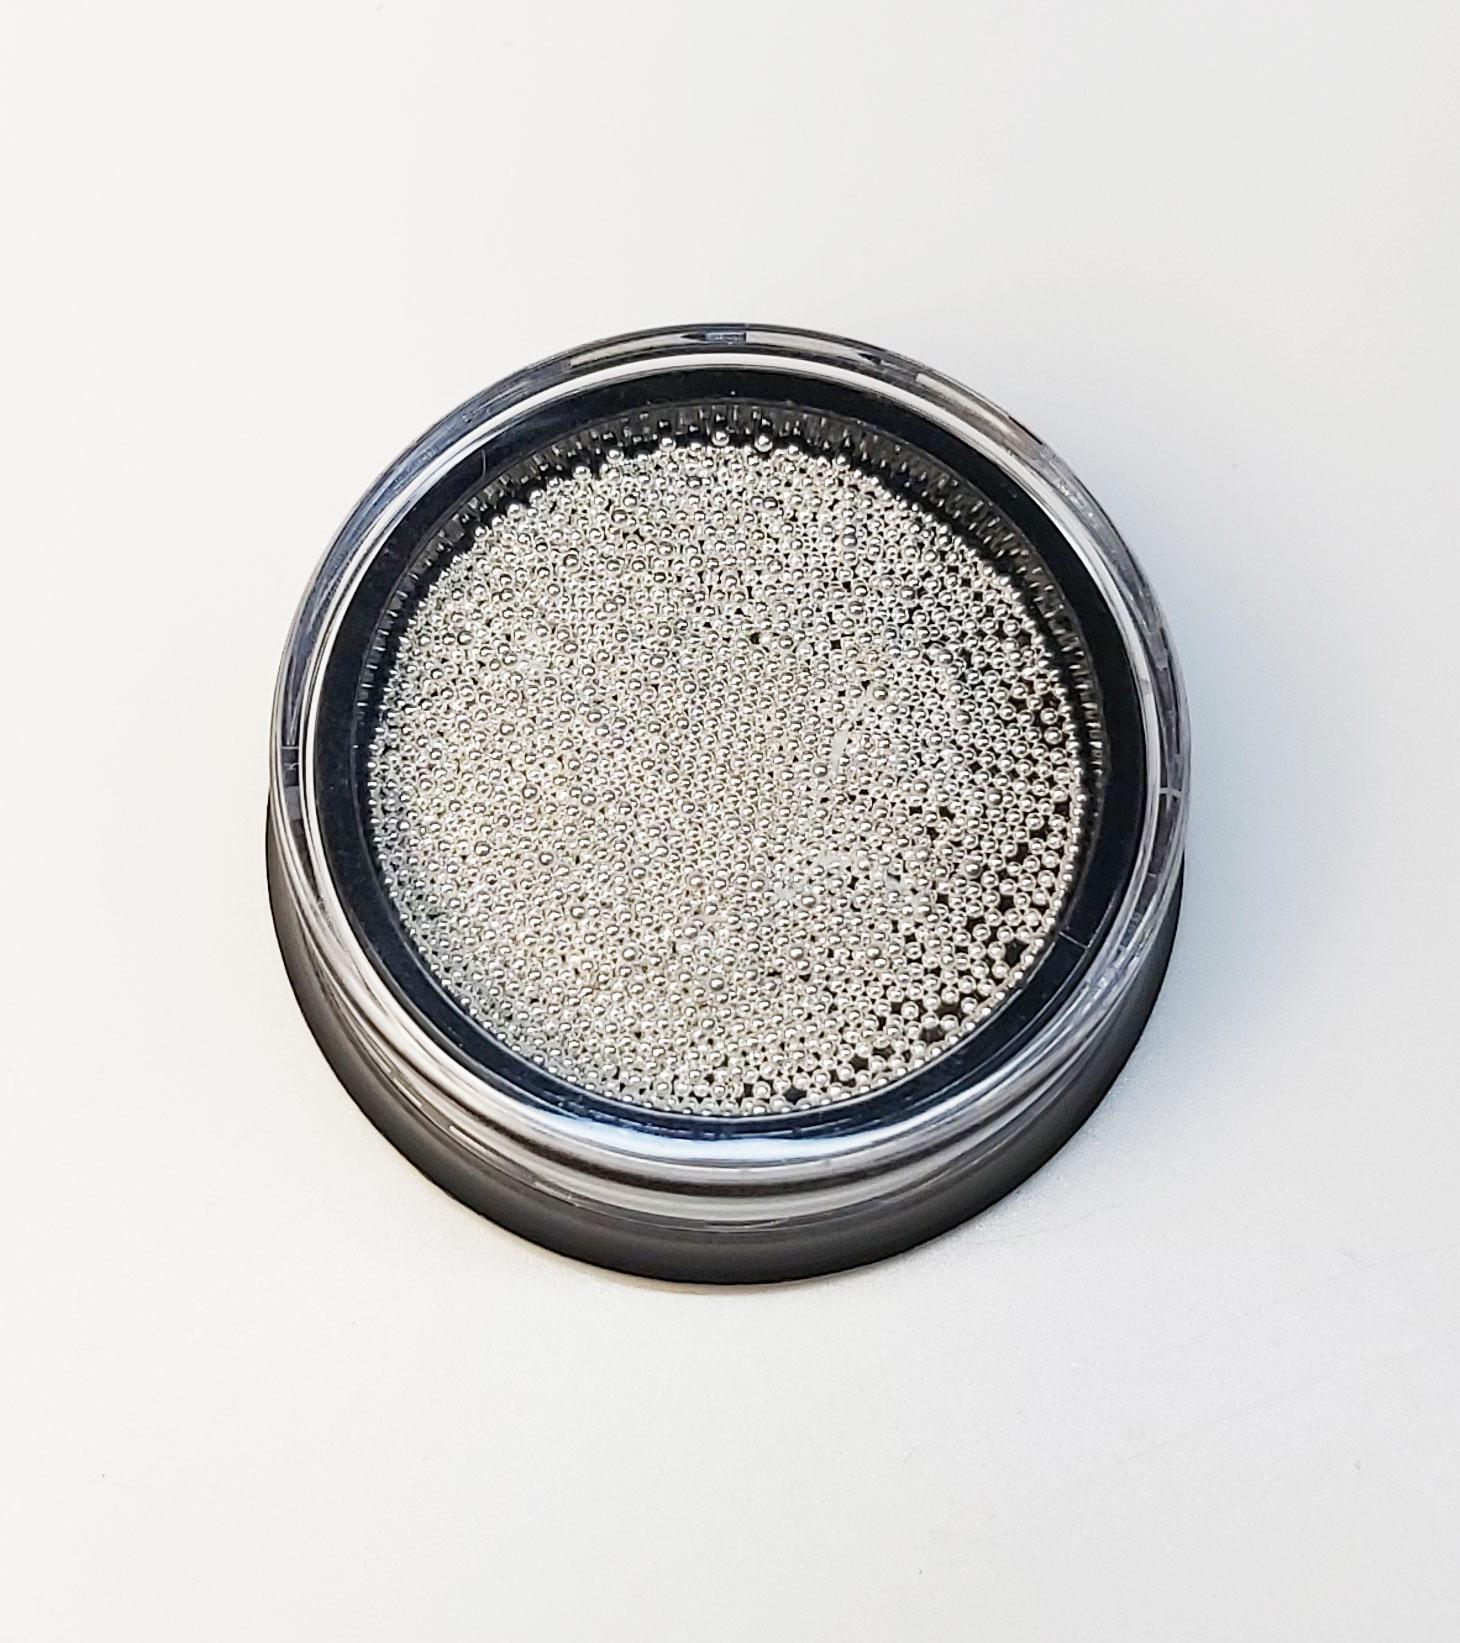 Silber. Mikroperlen 0,6mm. Edelstahl